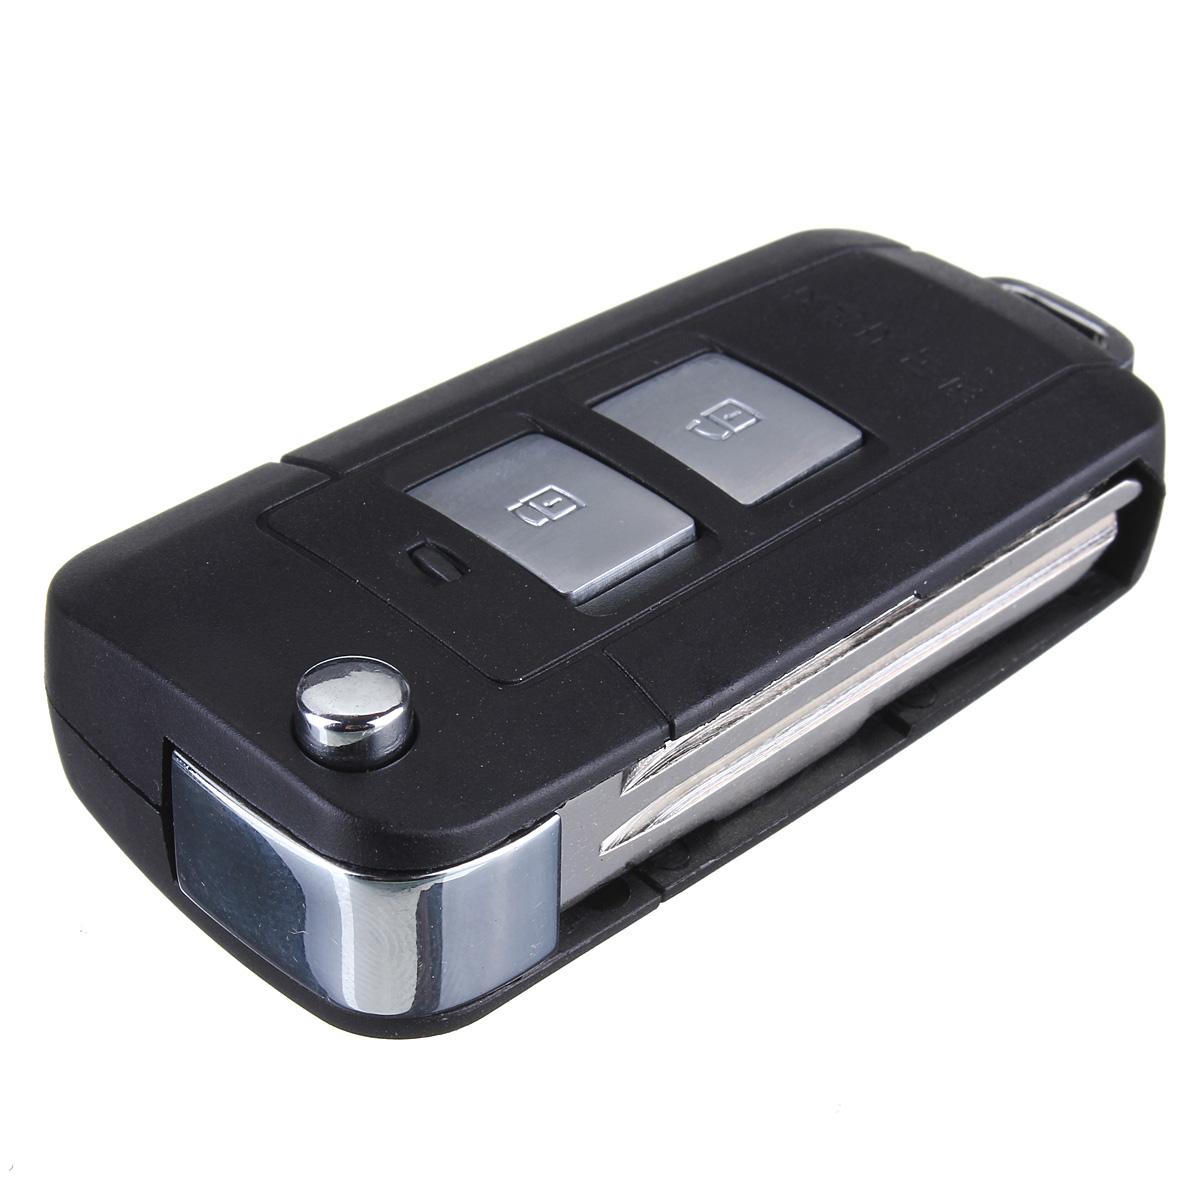 buy folding flip remote key case shell for hyundai tucson. Black Bedroom Furniture Sets. Home Design Ideas